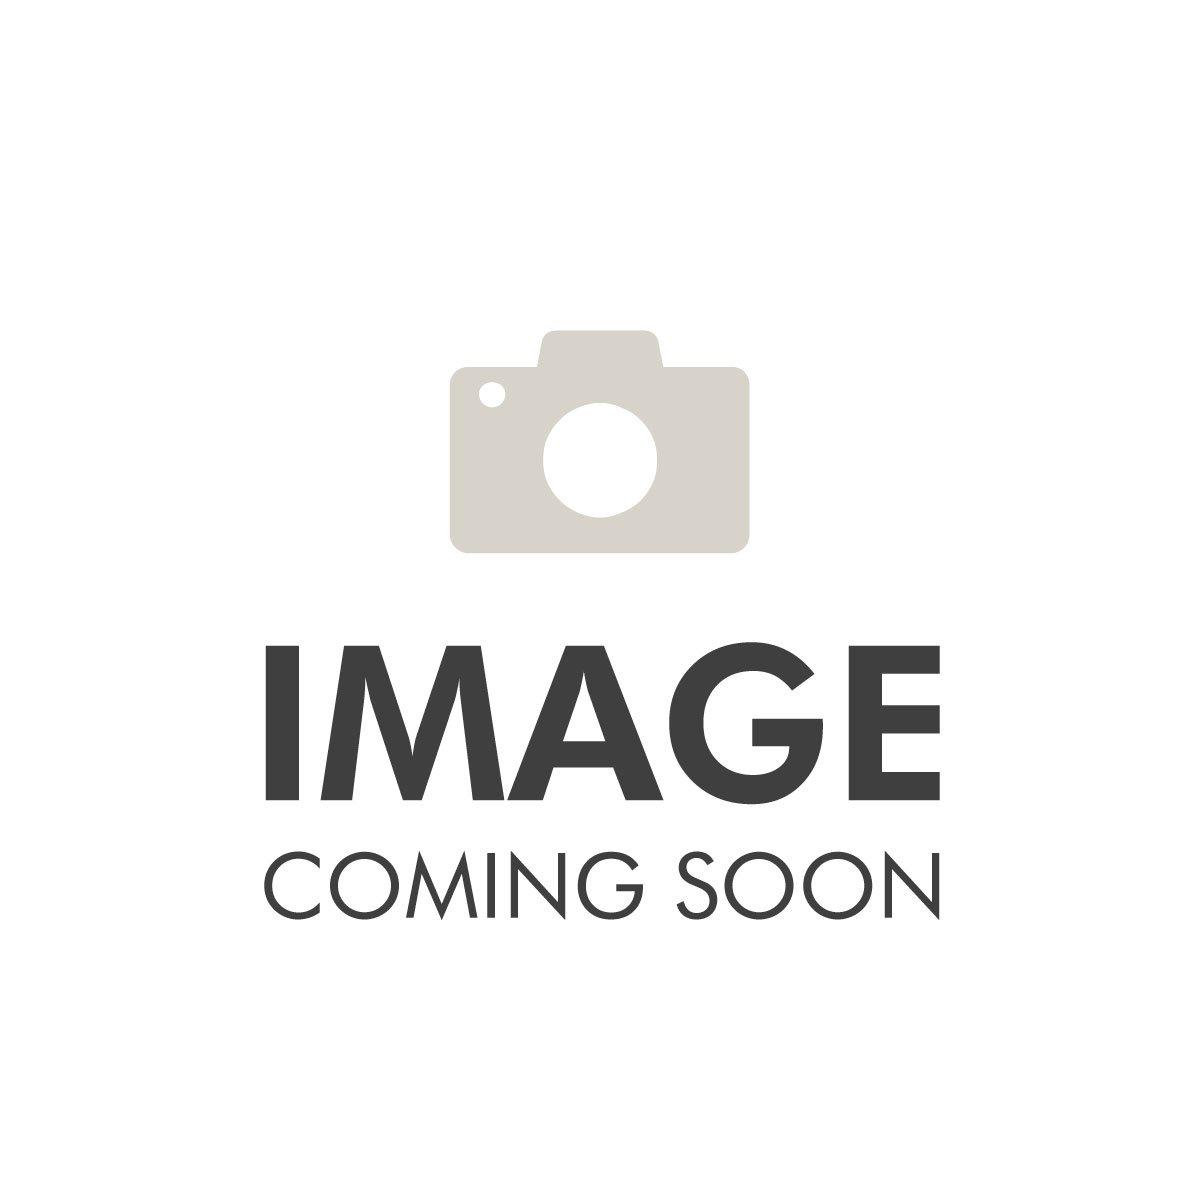 Moschino Light Clouds 30ml Eau De Toilette Spray for Women